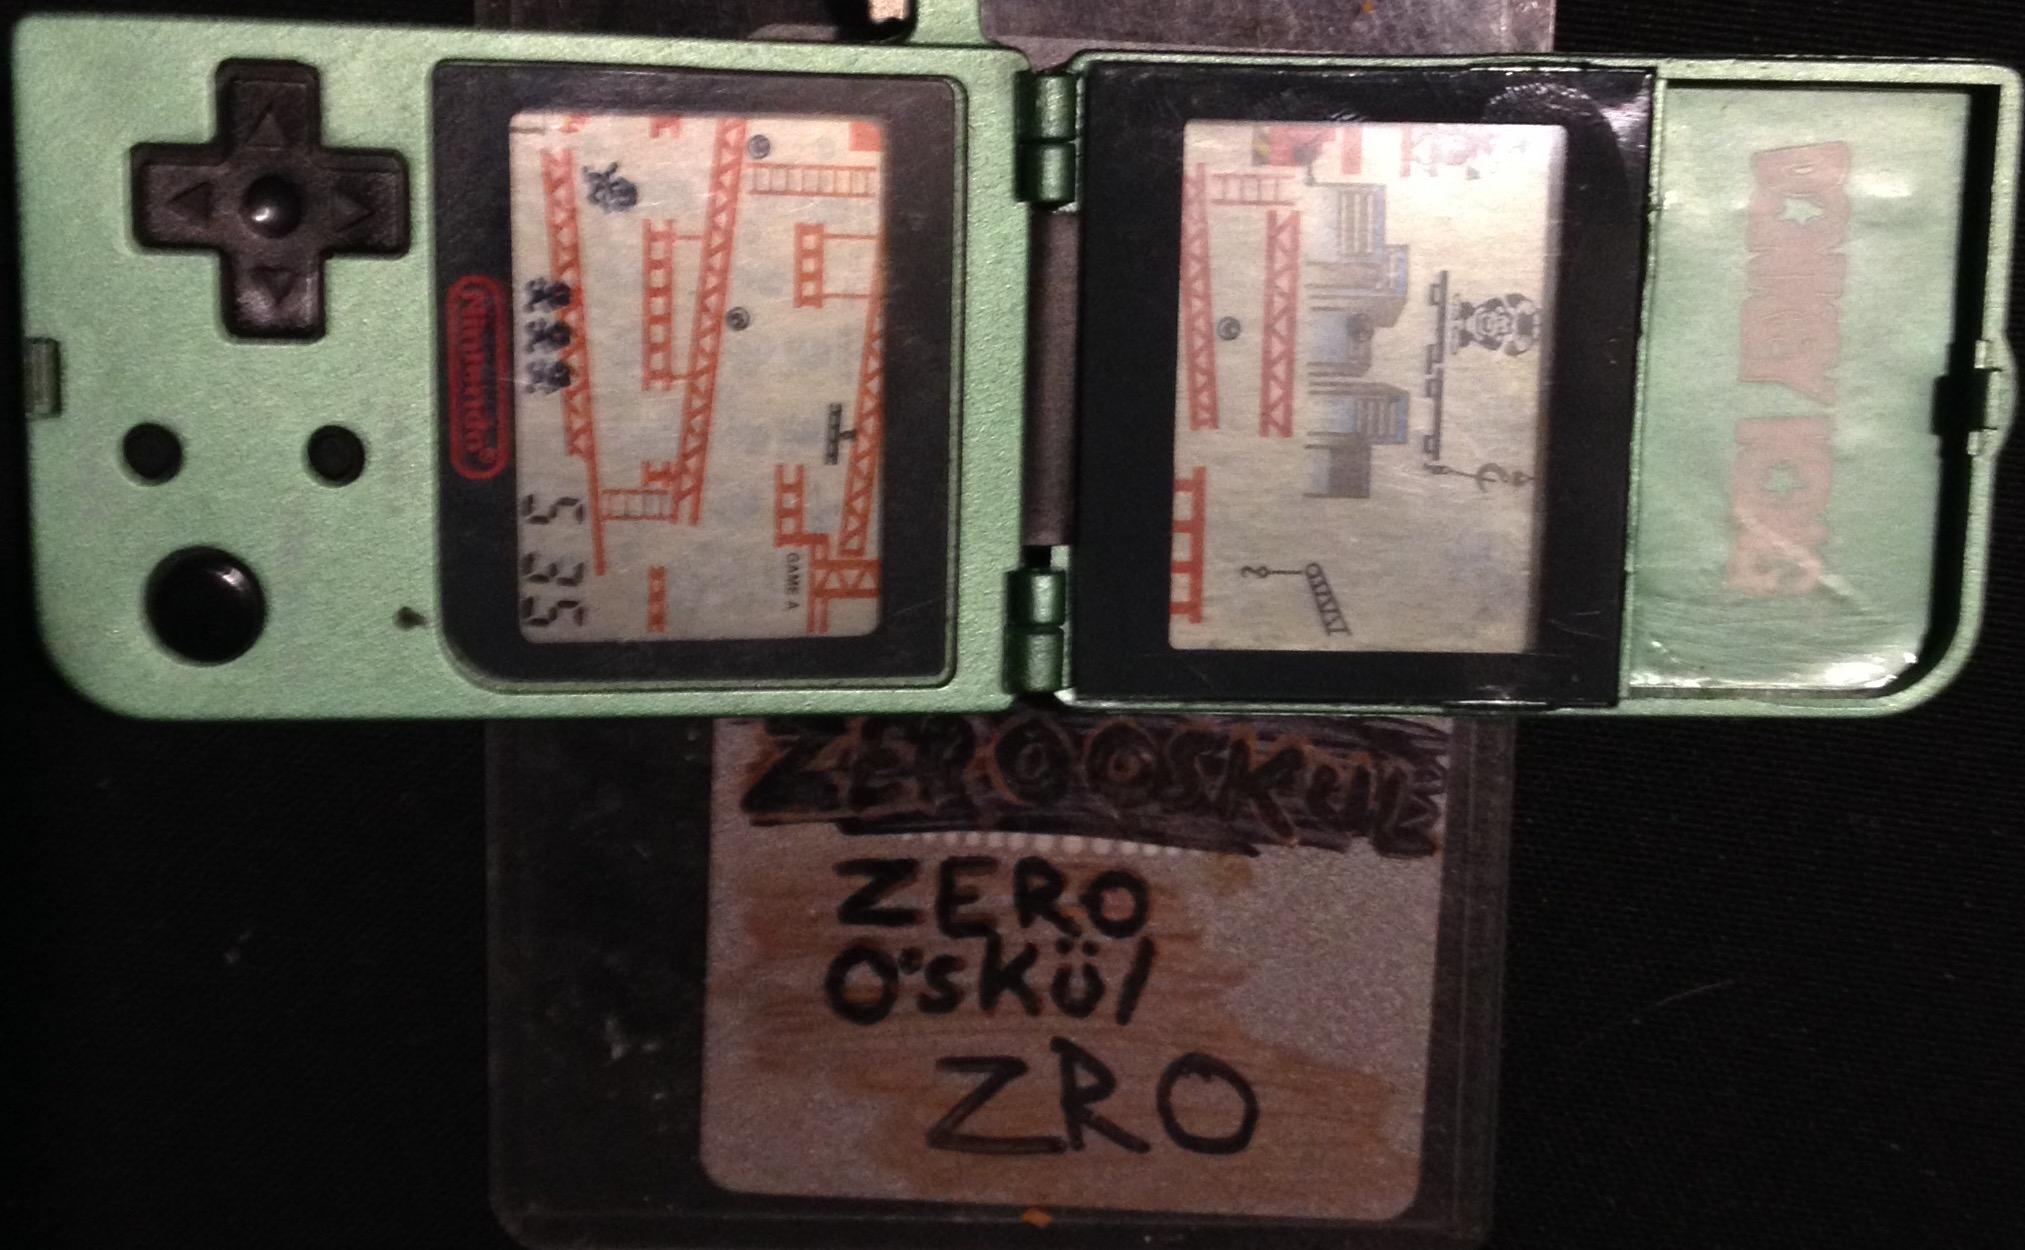 zerooskul: Nintendo Mini Classics: Donkey Kong [Game A] (Dedicated Handheld) 810 points on 2019-09-17 15:31:18